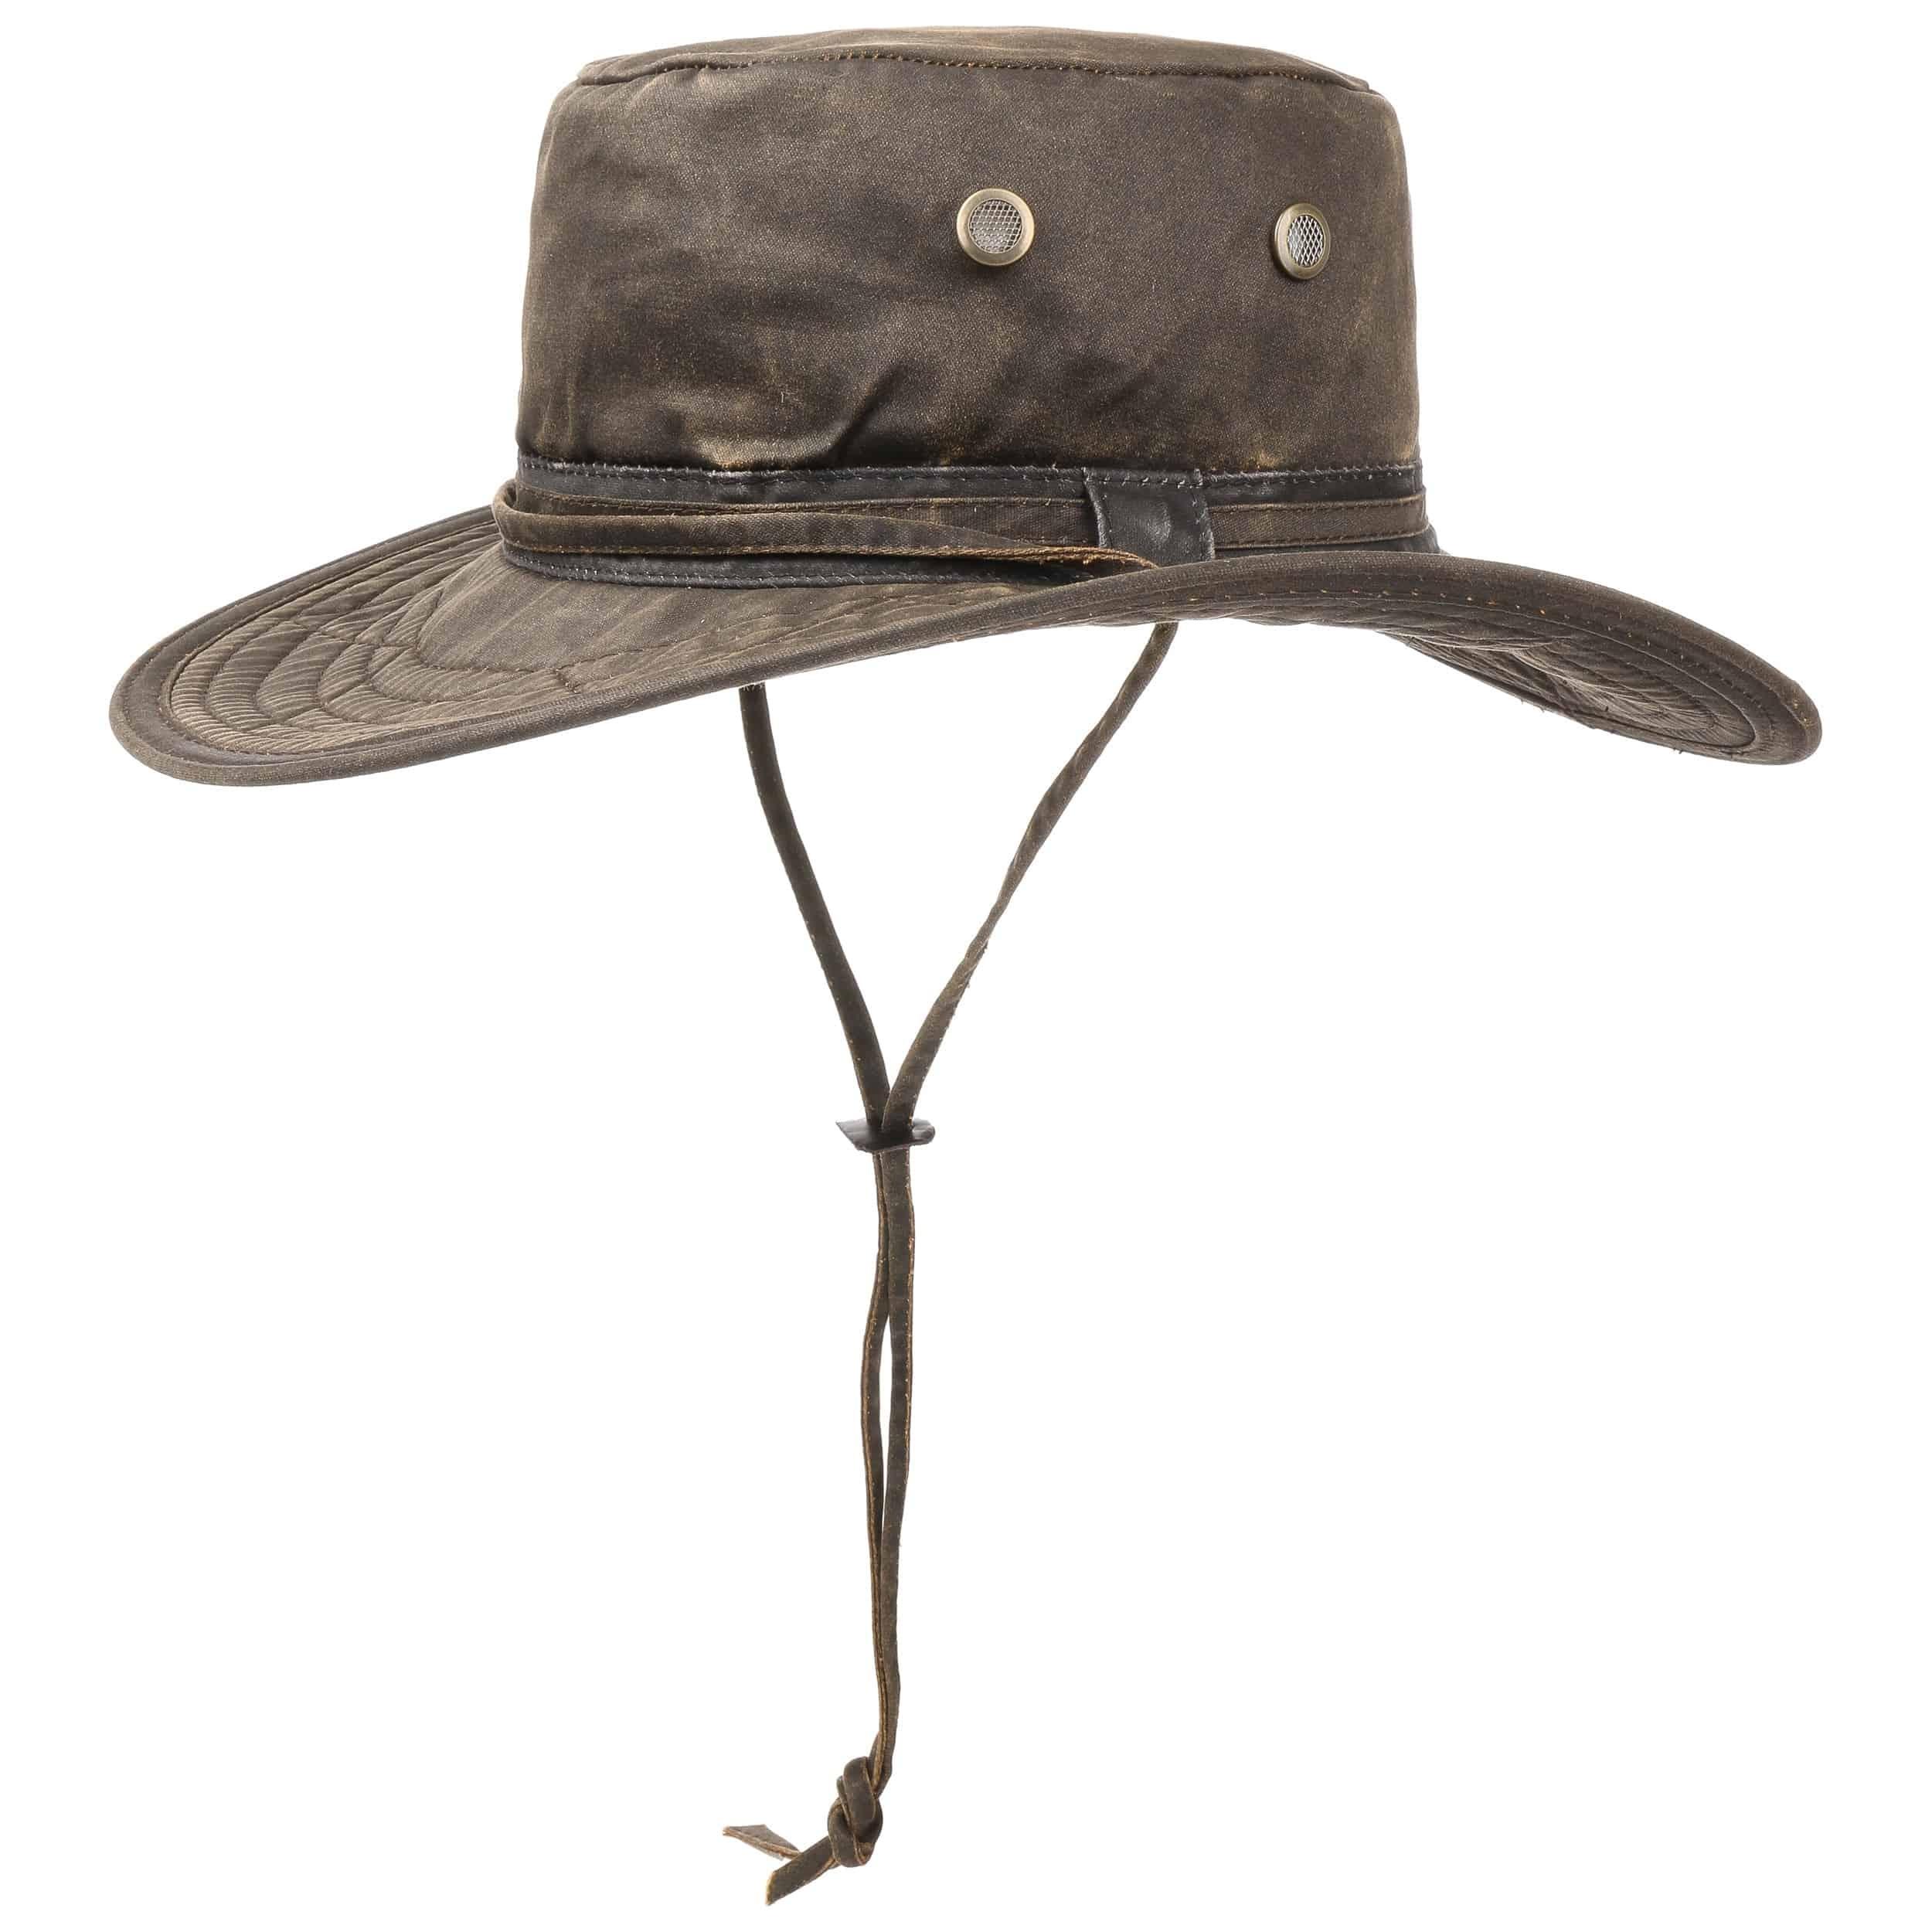 Talla S Chambergo boonie pamela sombrero coyote RipStop militar casual